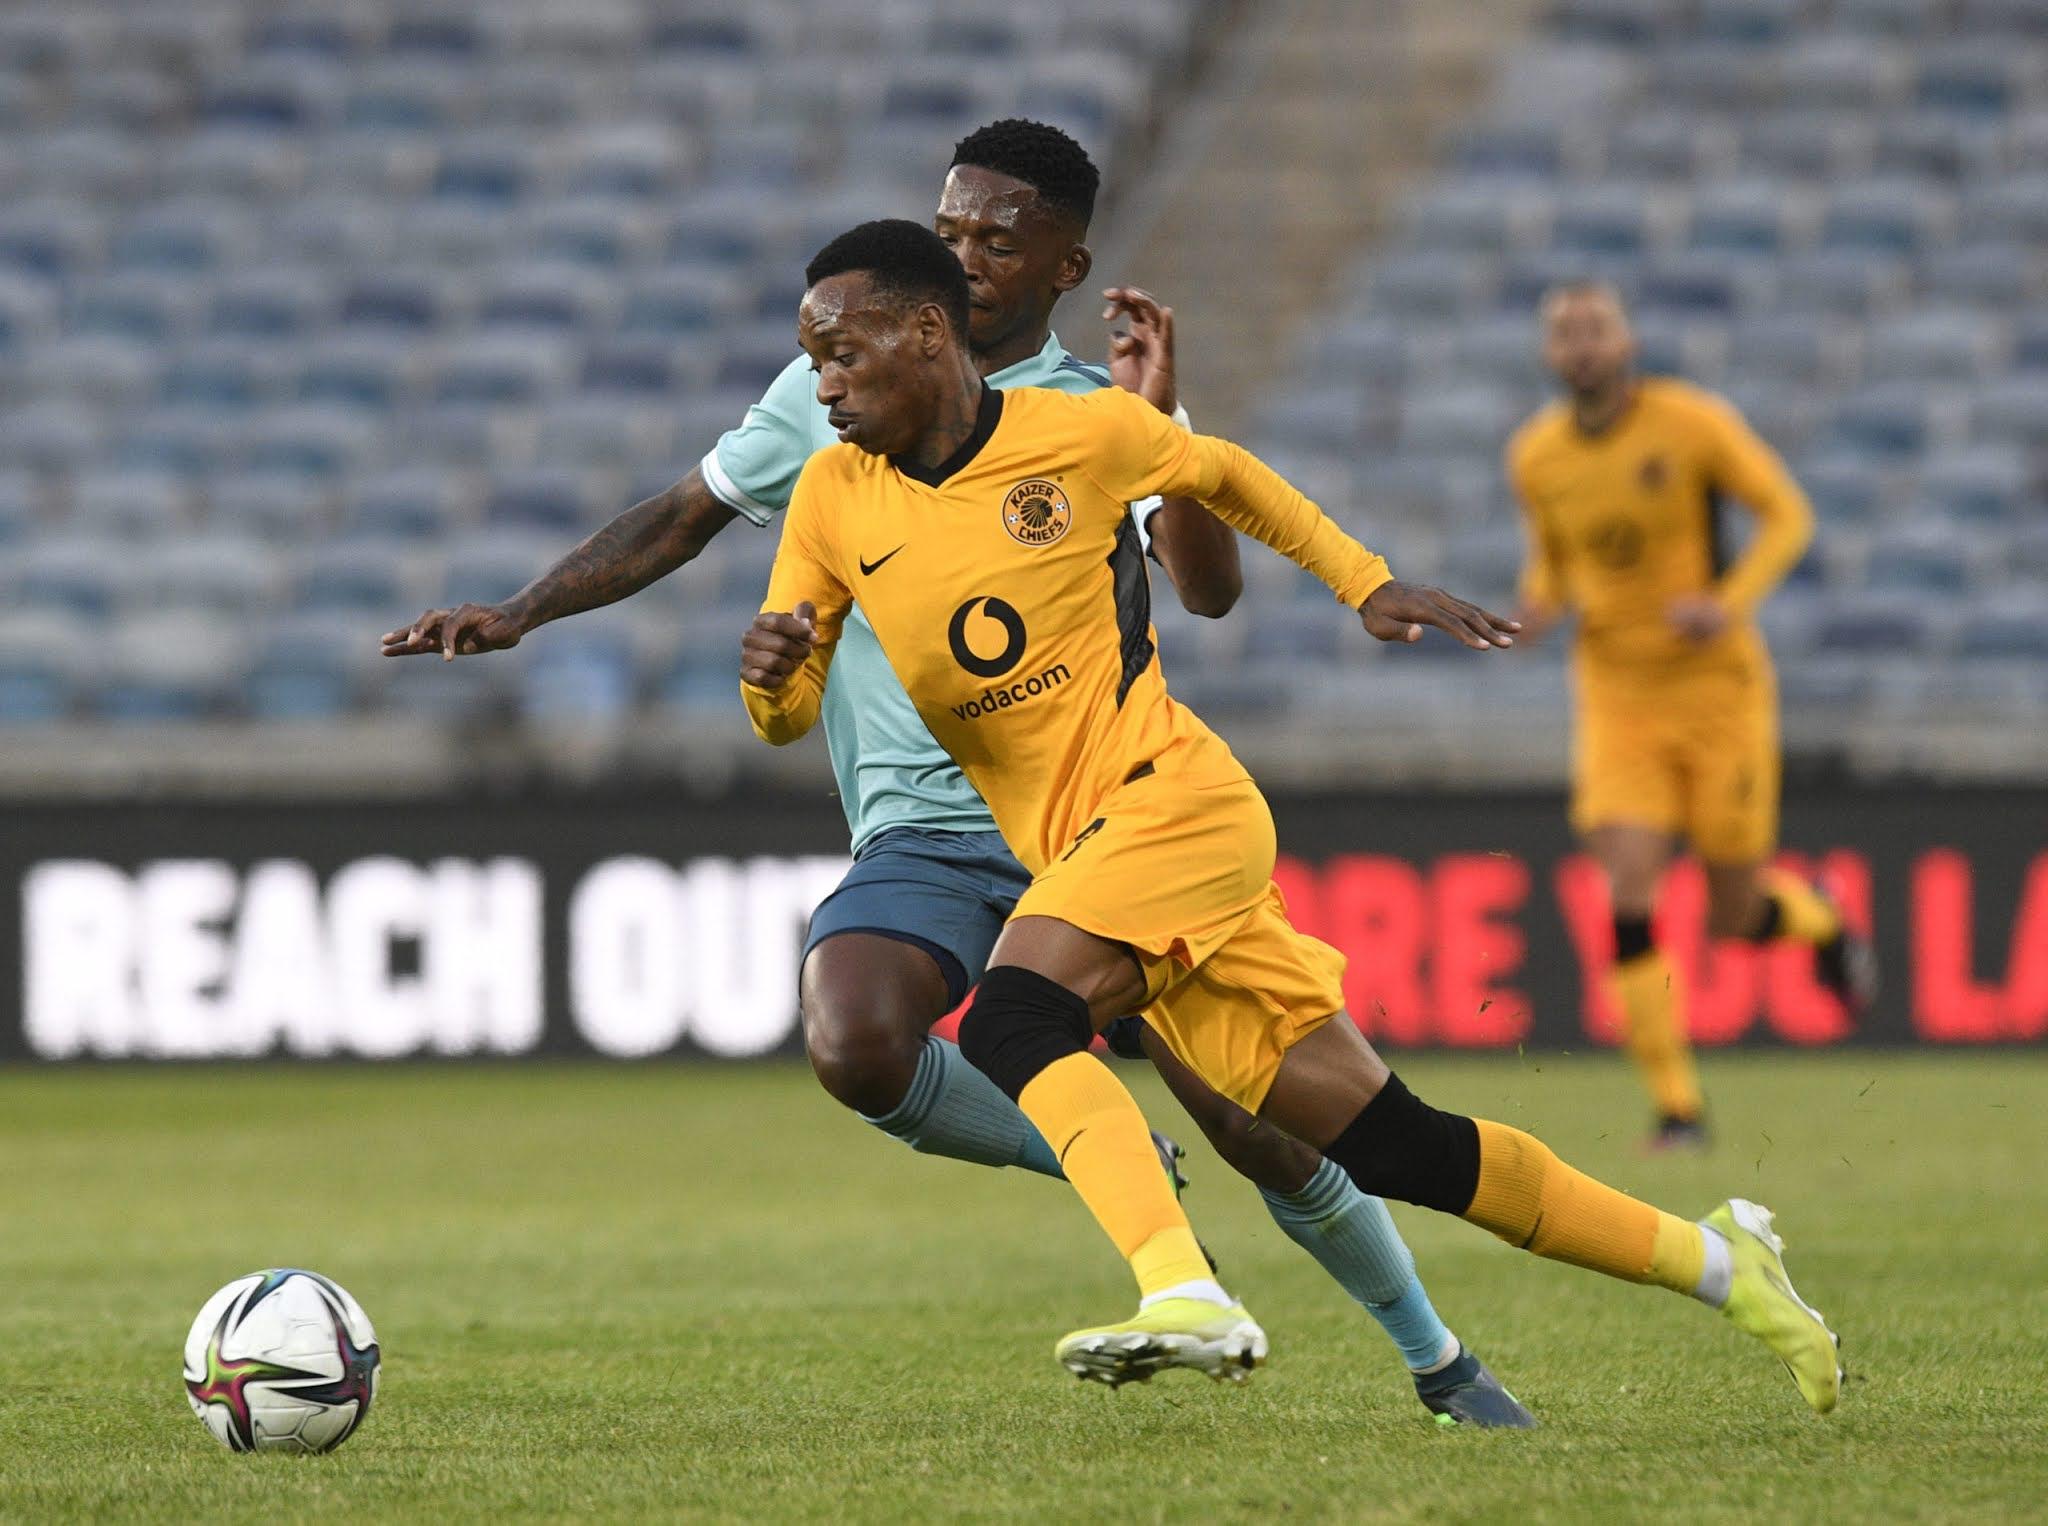 Kaizer Chiefs forward Khama Billiat